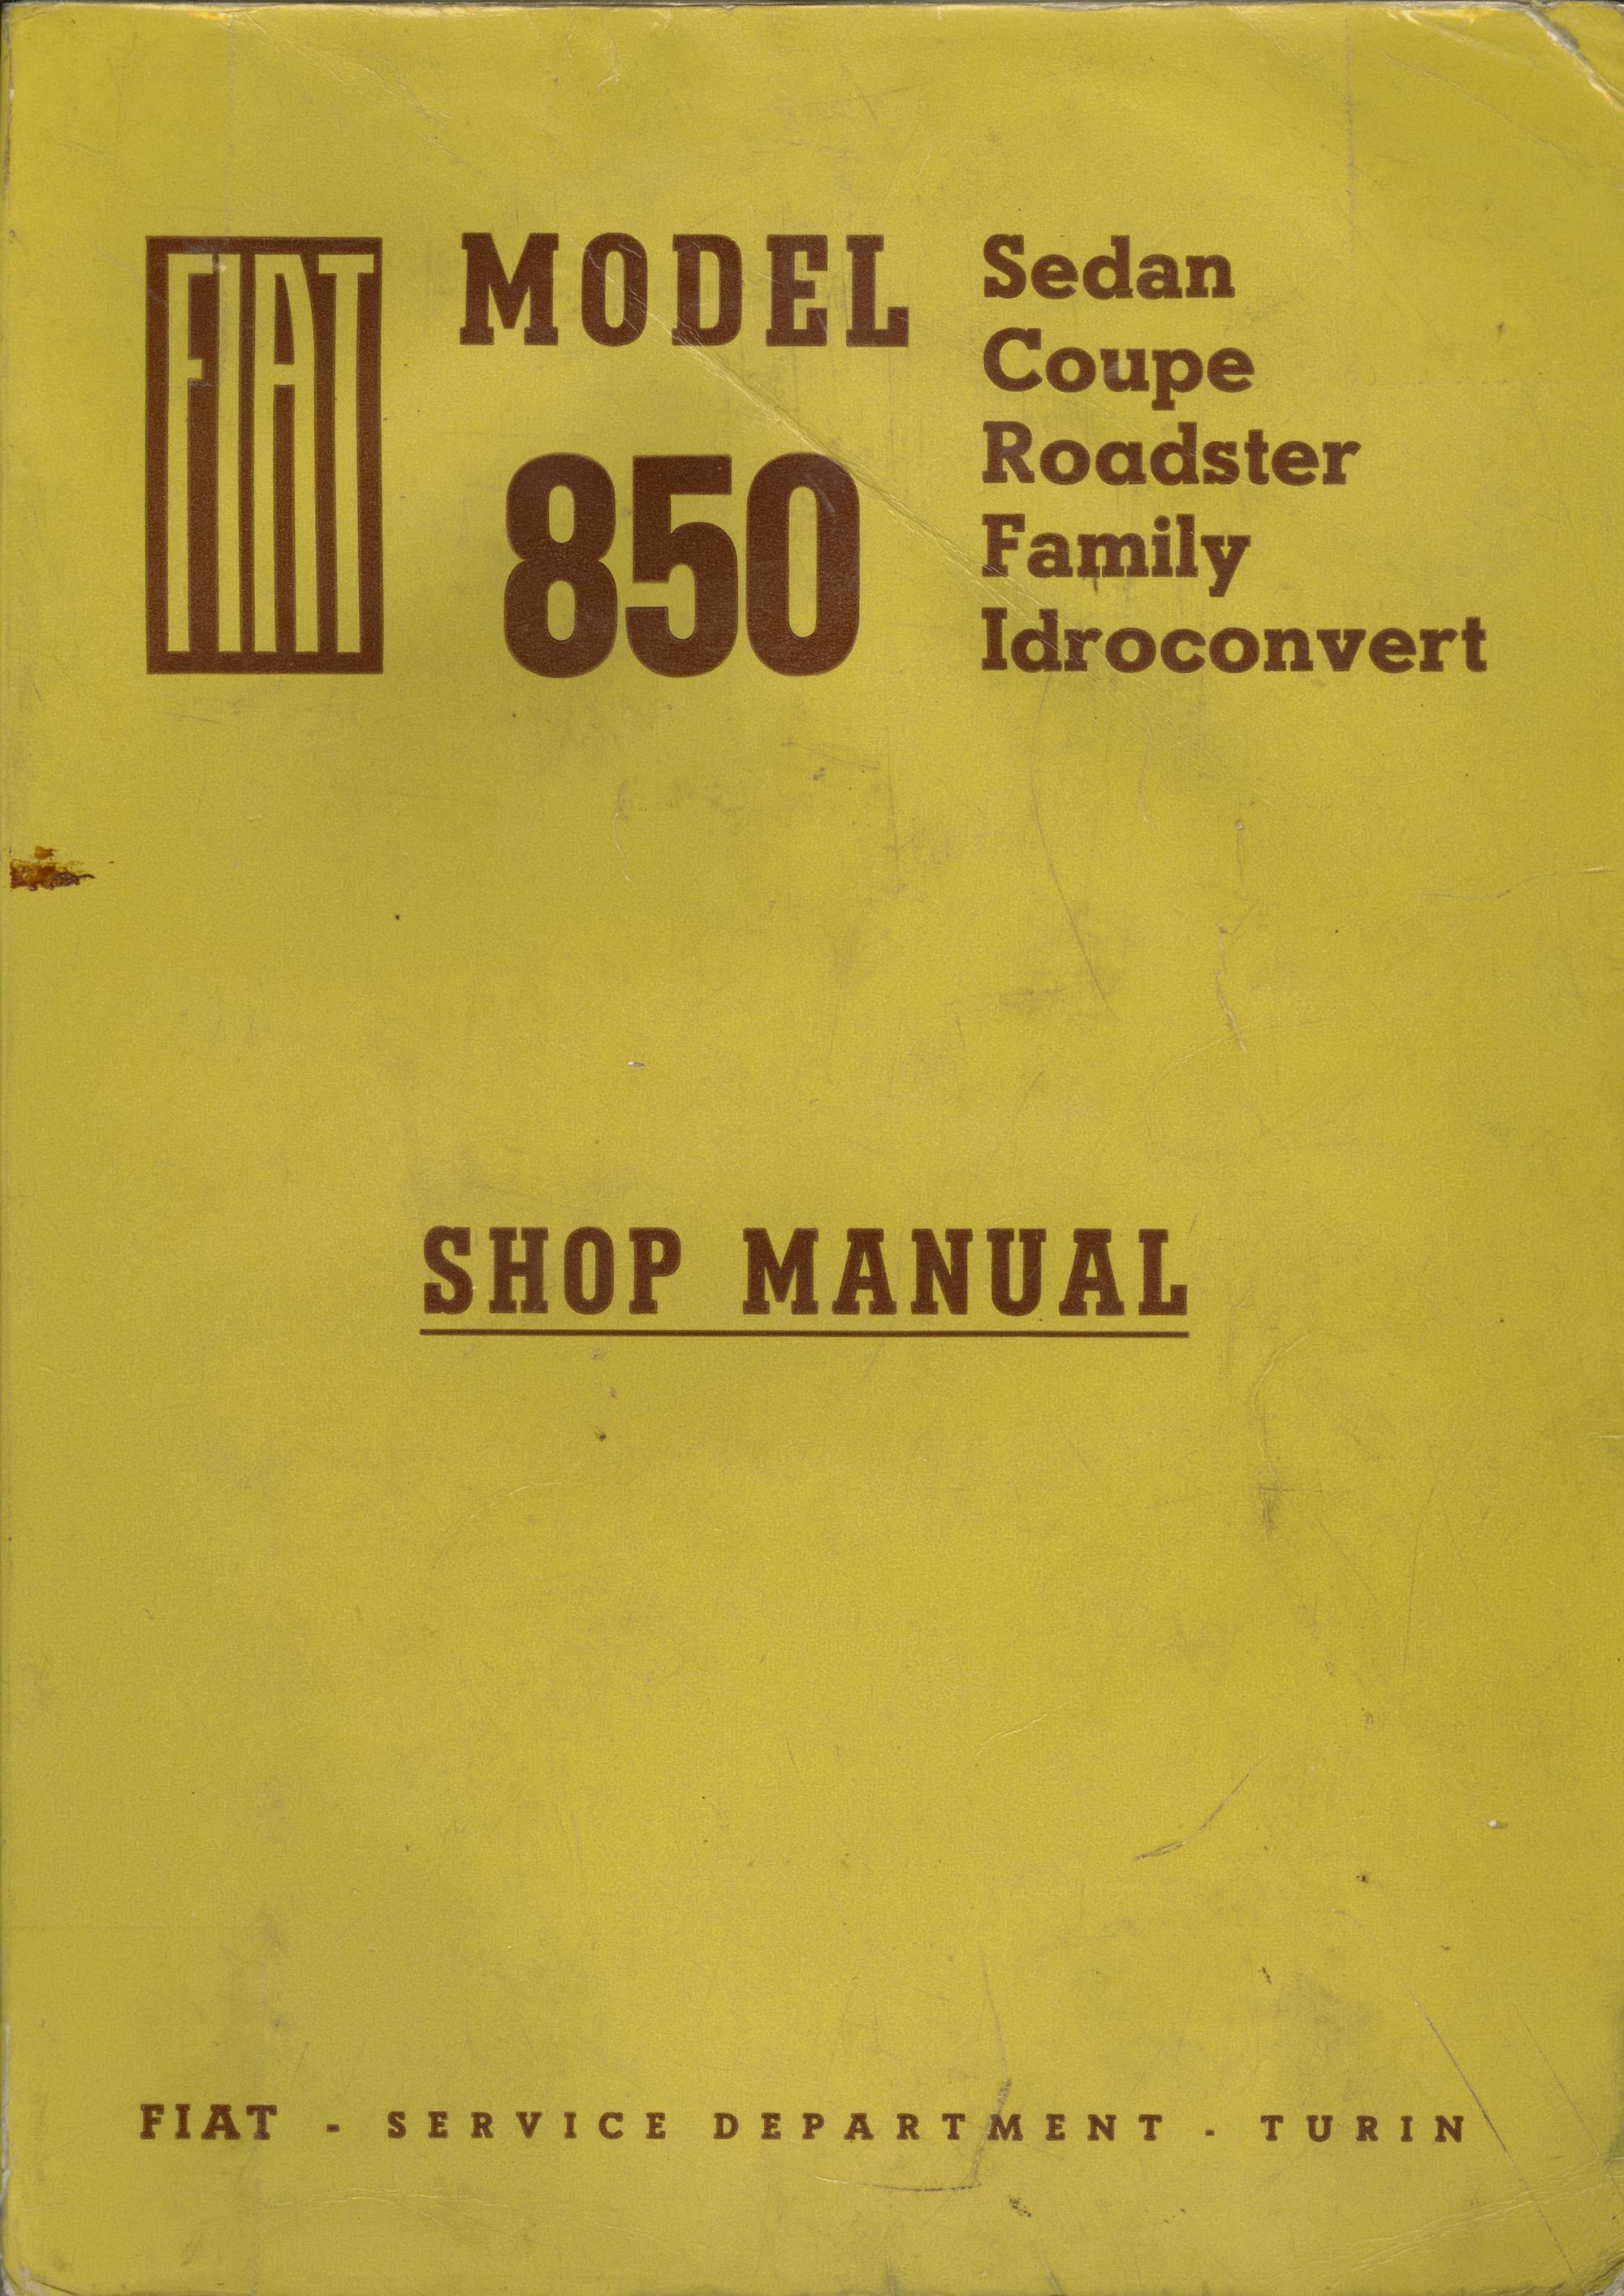 hight resolution of fiat 850 shop manual